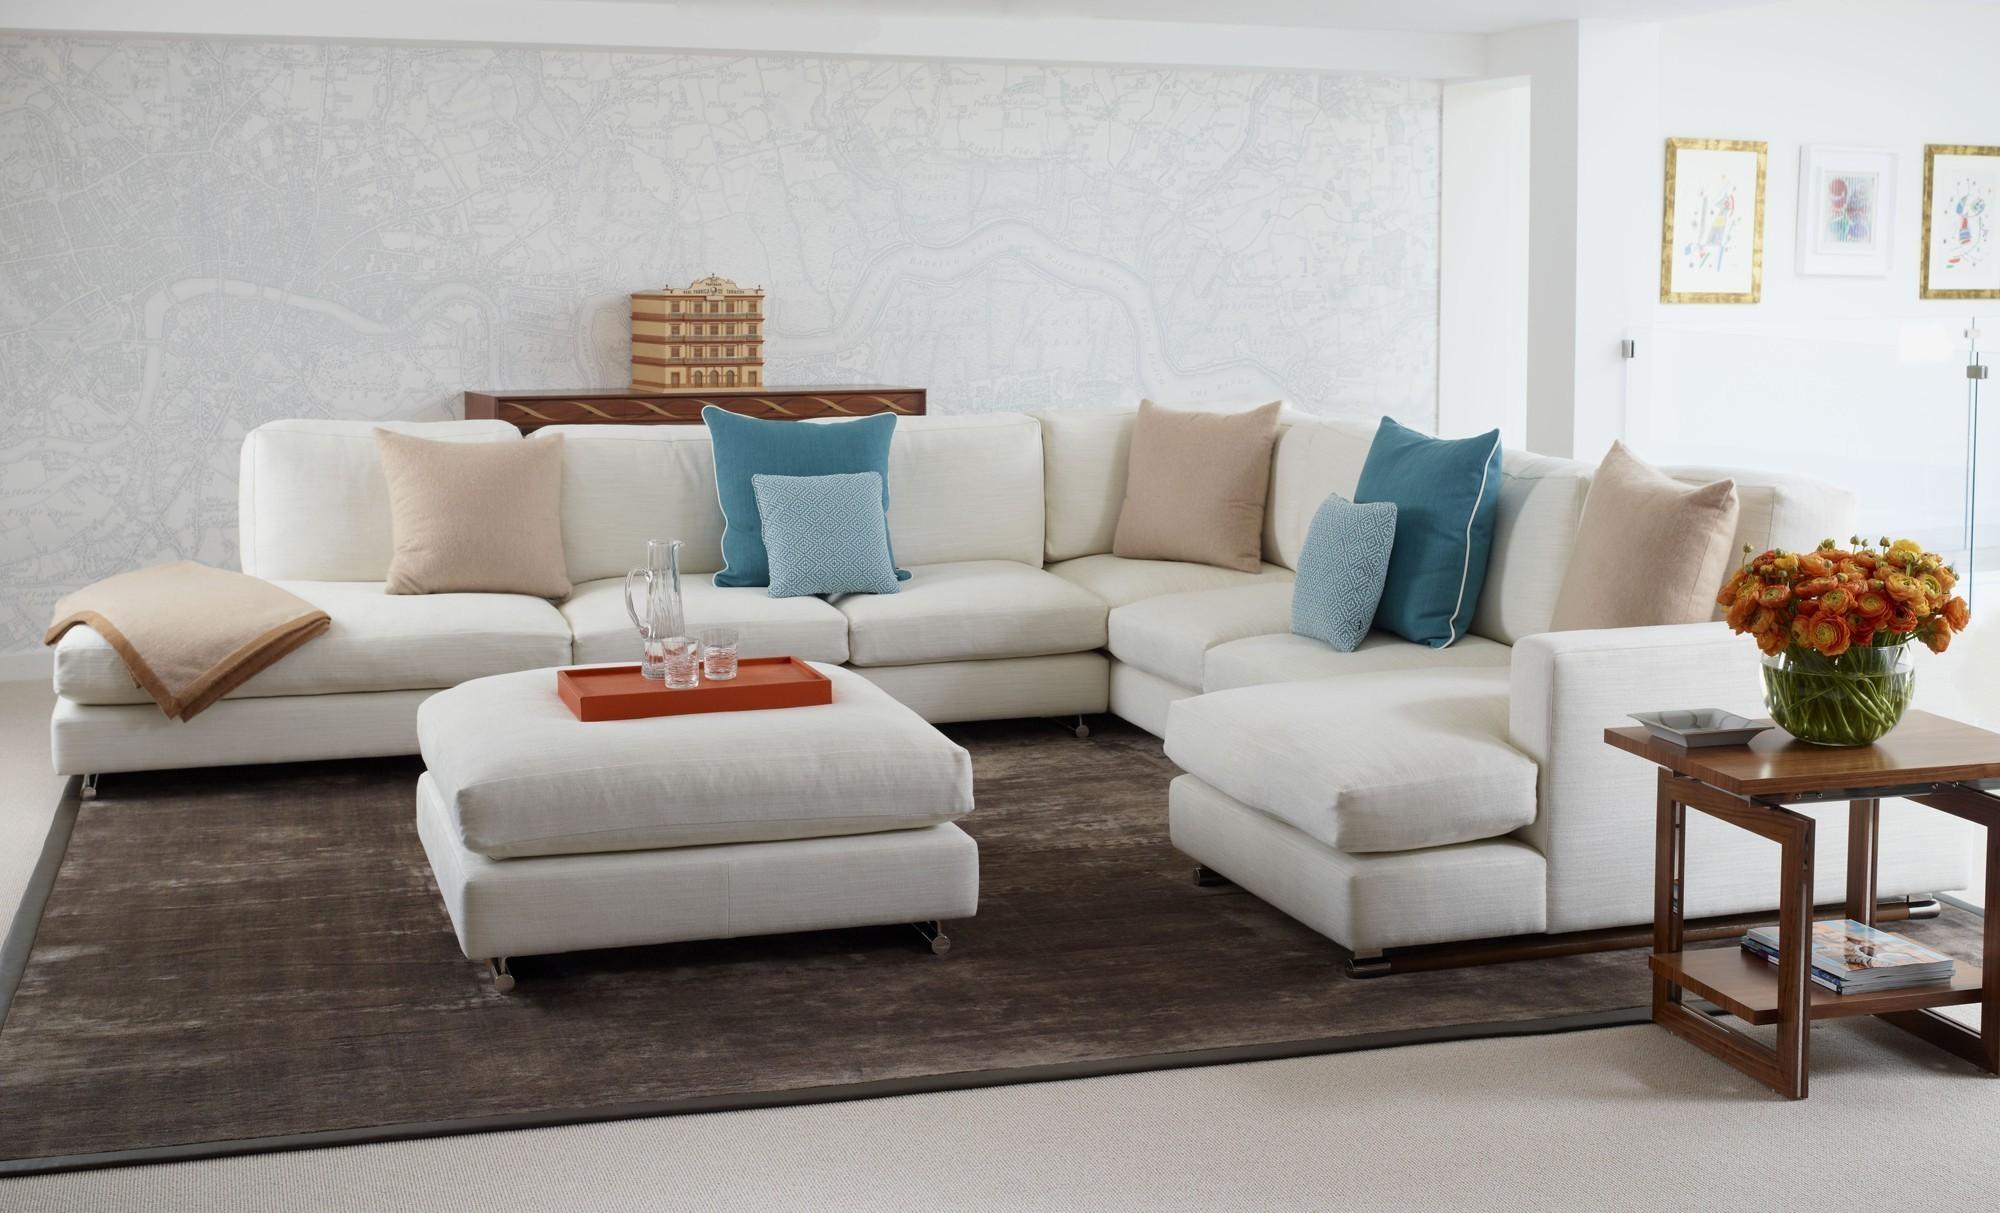 Small L Shaped Sofa | Sofa Gallery | Kengire Regarding Small L Shaped Sofas (Image 14 of 20)